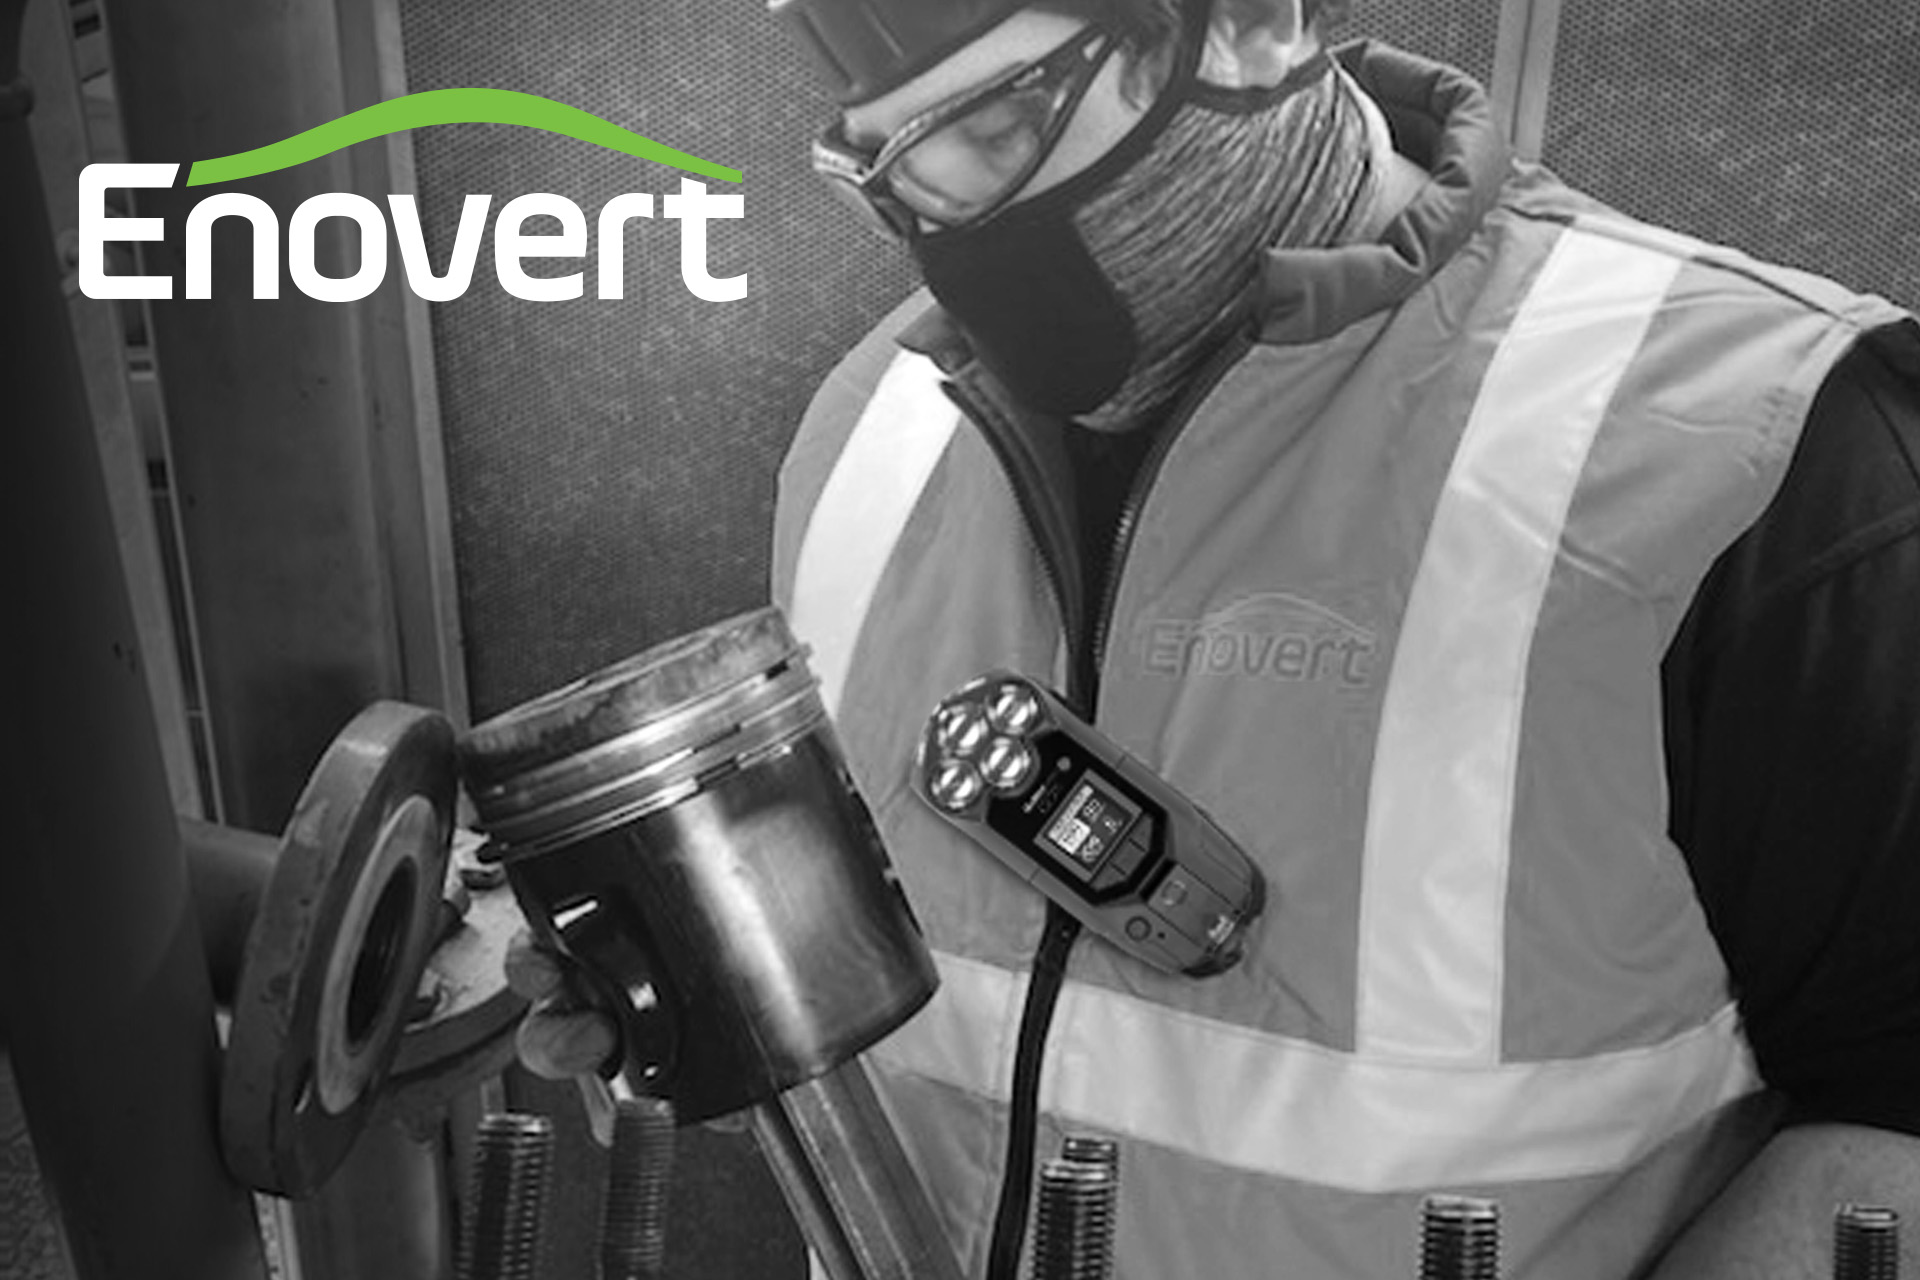 Safety Enovert